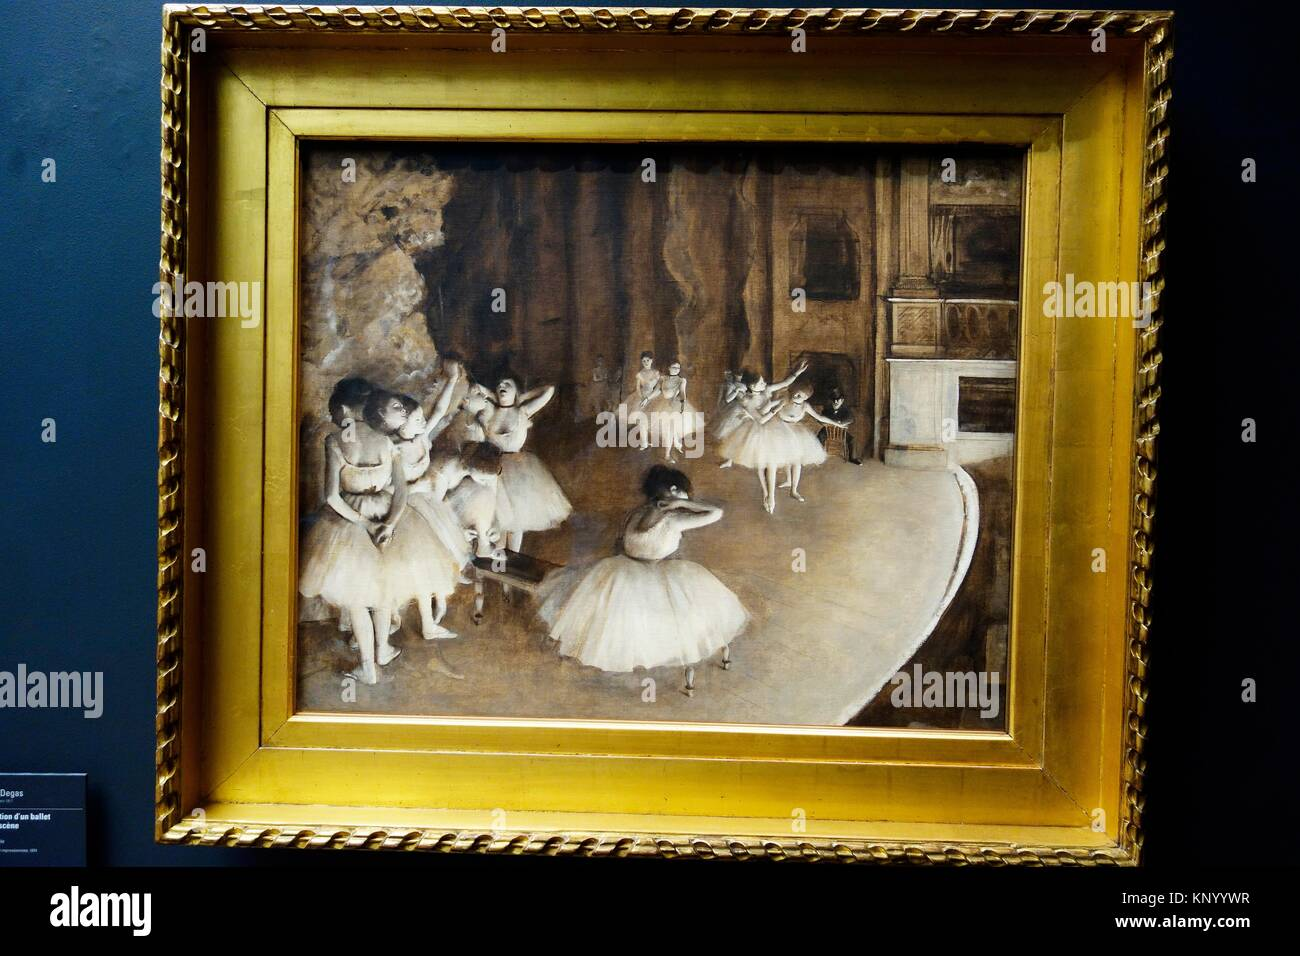 Wiederholung d'un Ballett sur la Scene. 1874. Edgar Degas. Museum Orsay. Paris. Frankreich. Europa. Stockbild